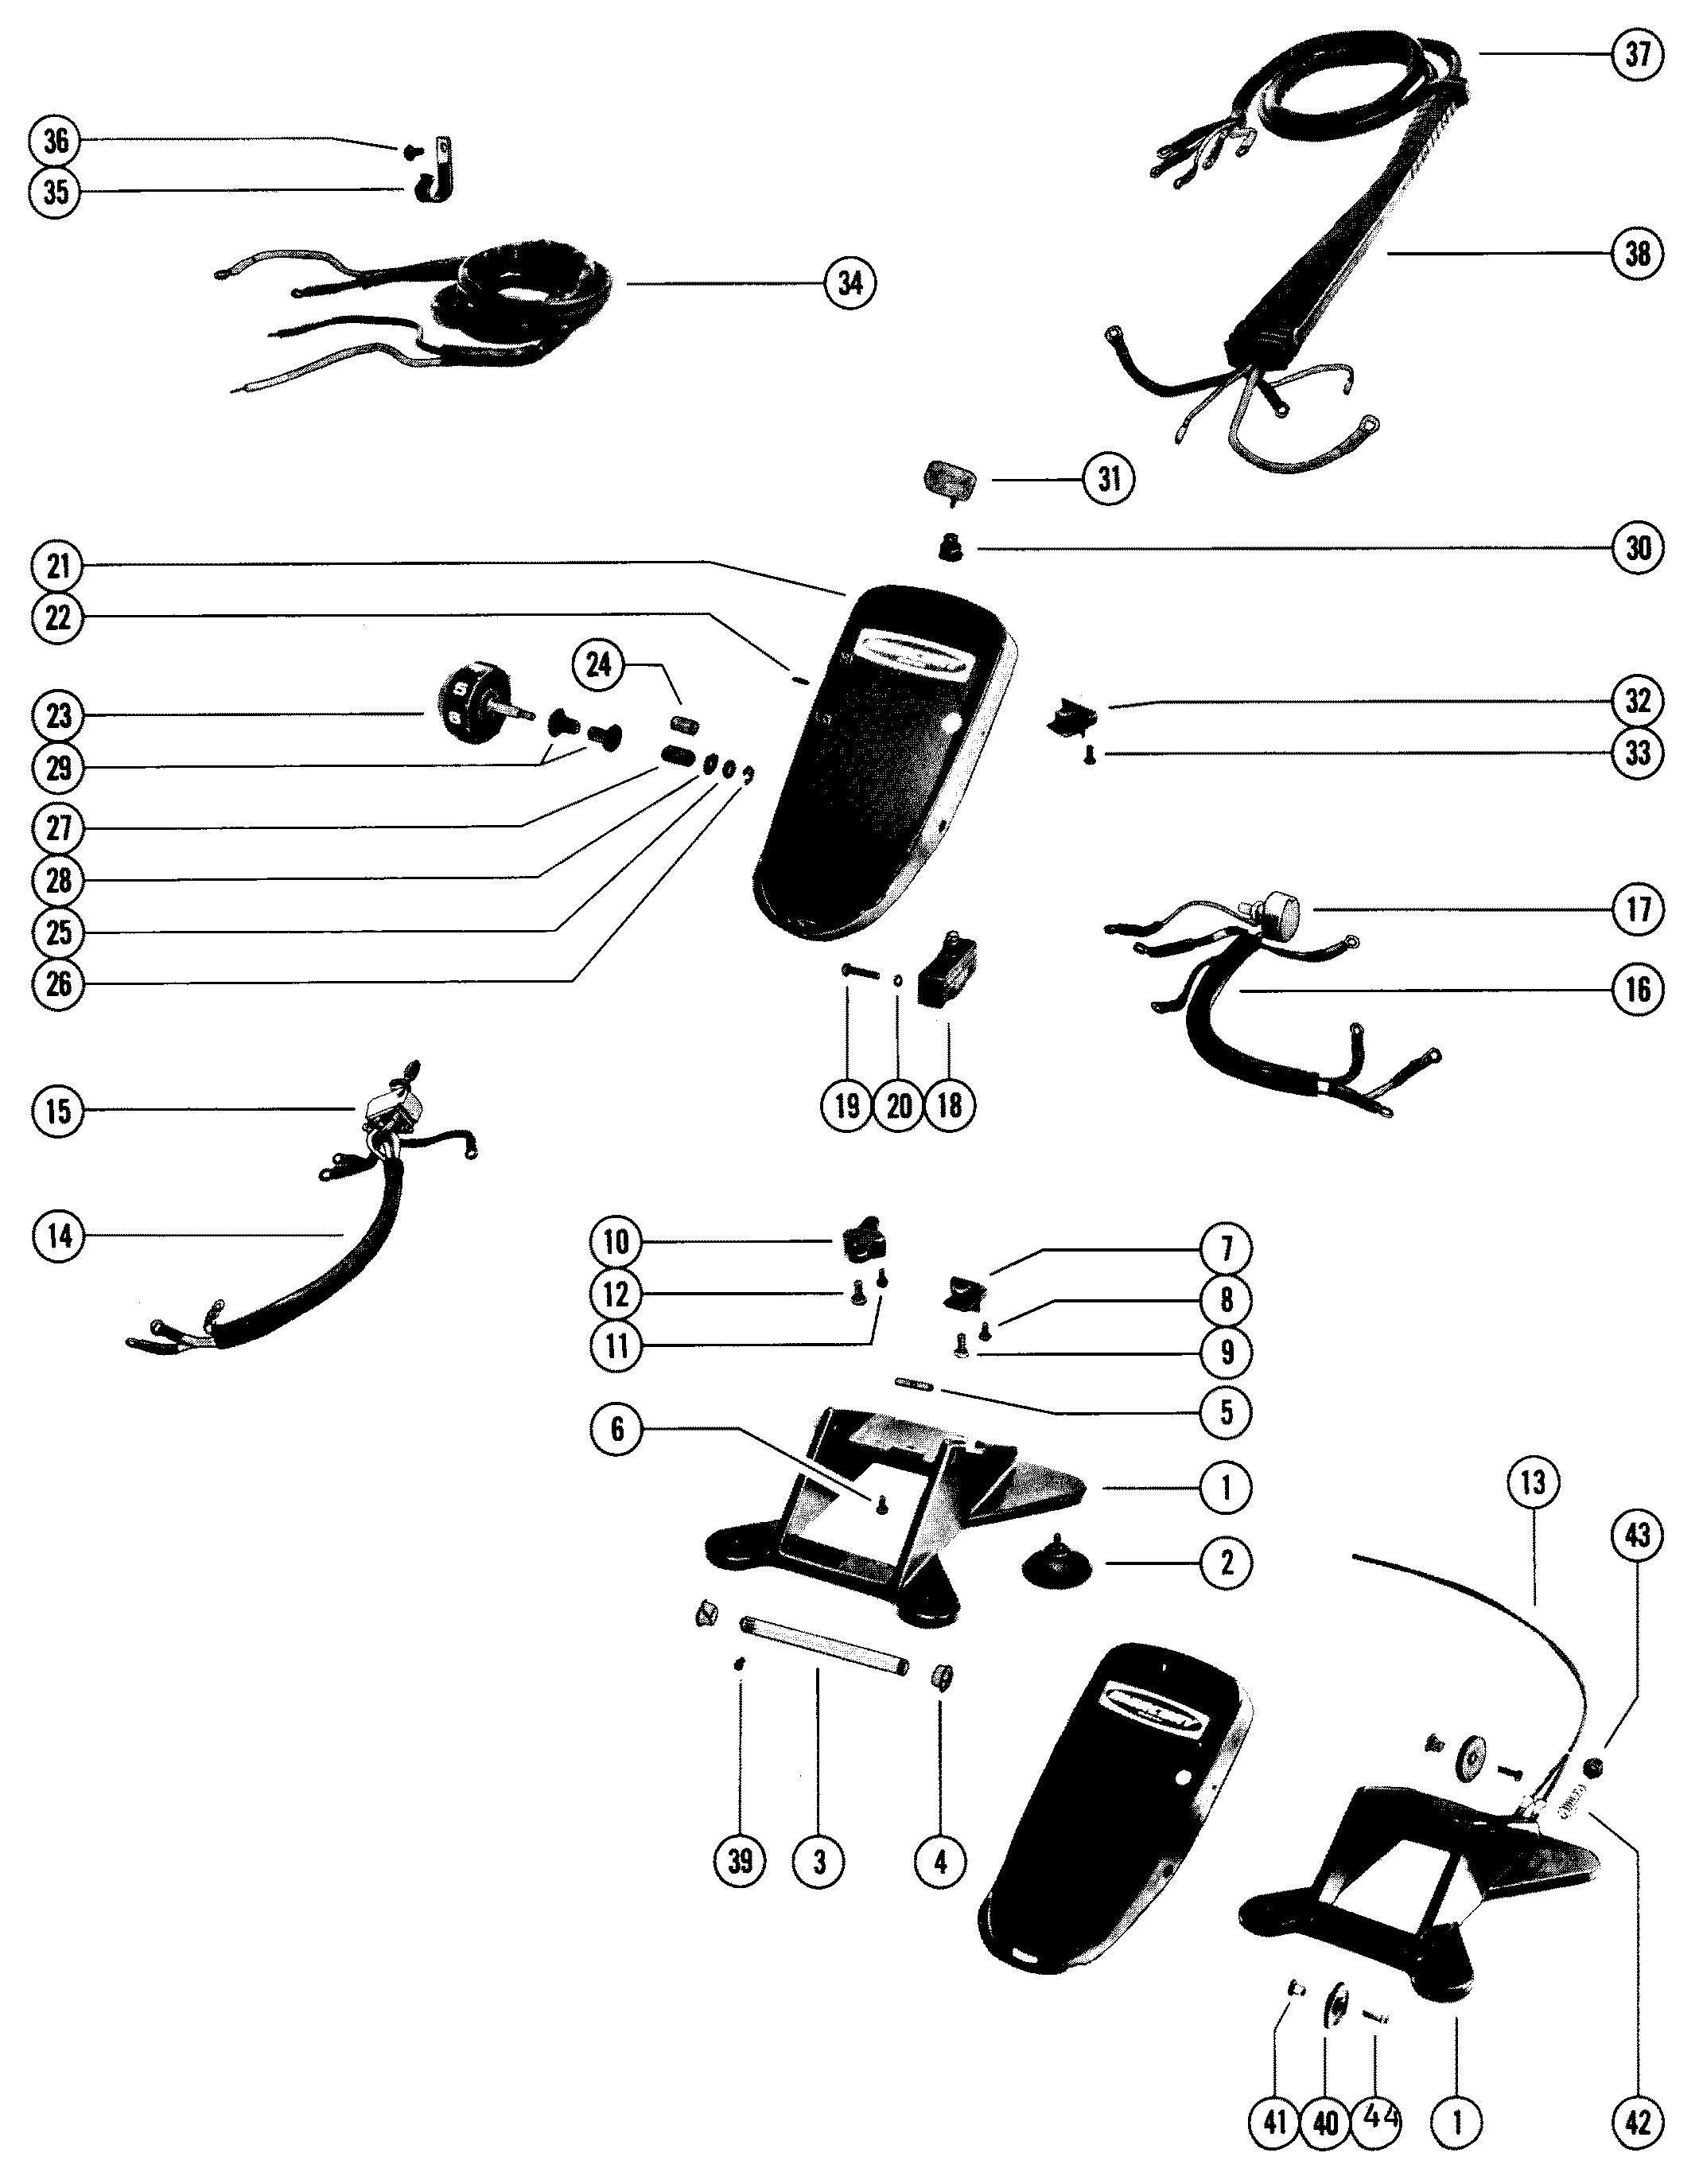 XR_7652] Trolling Motor Wiring Harness Schematic WiringAnist Aeocy Skat Peted Phae Mohammedshrine Librar Wiring 101